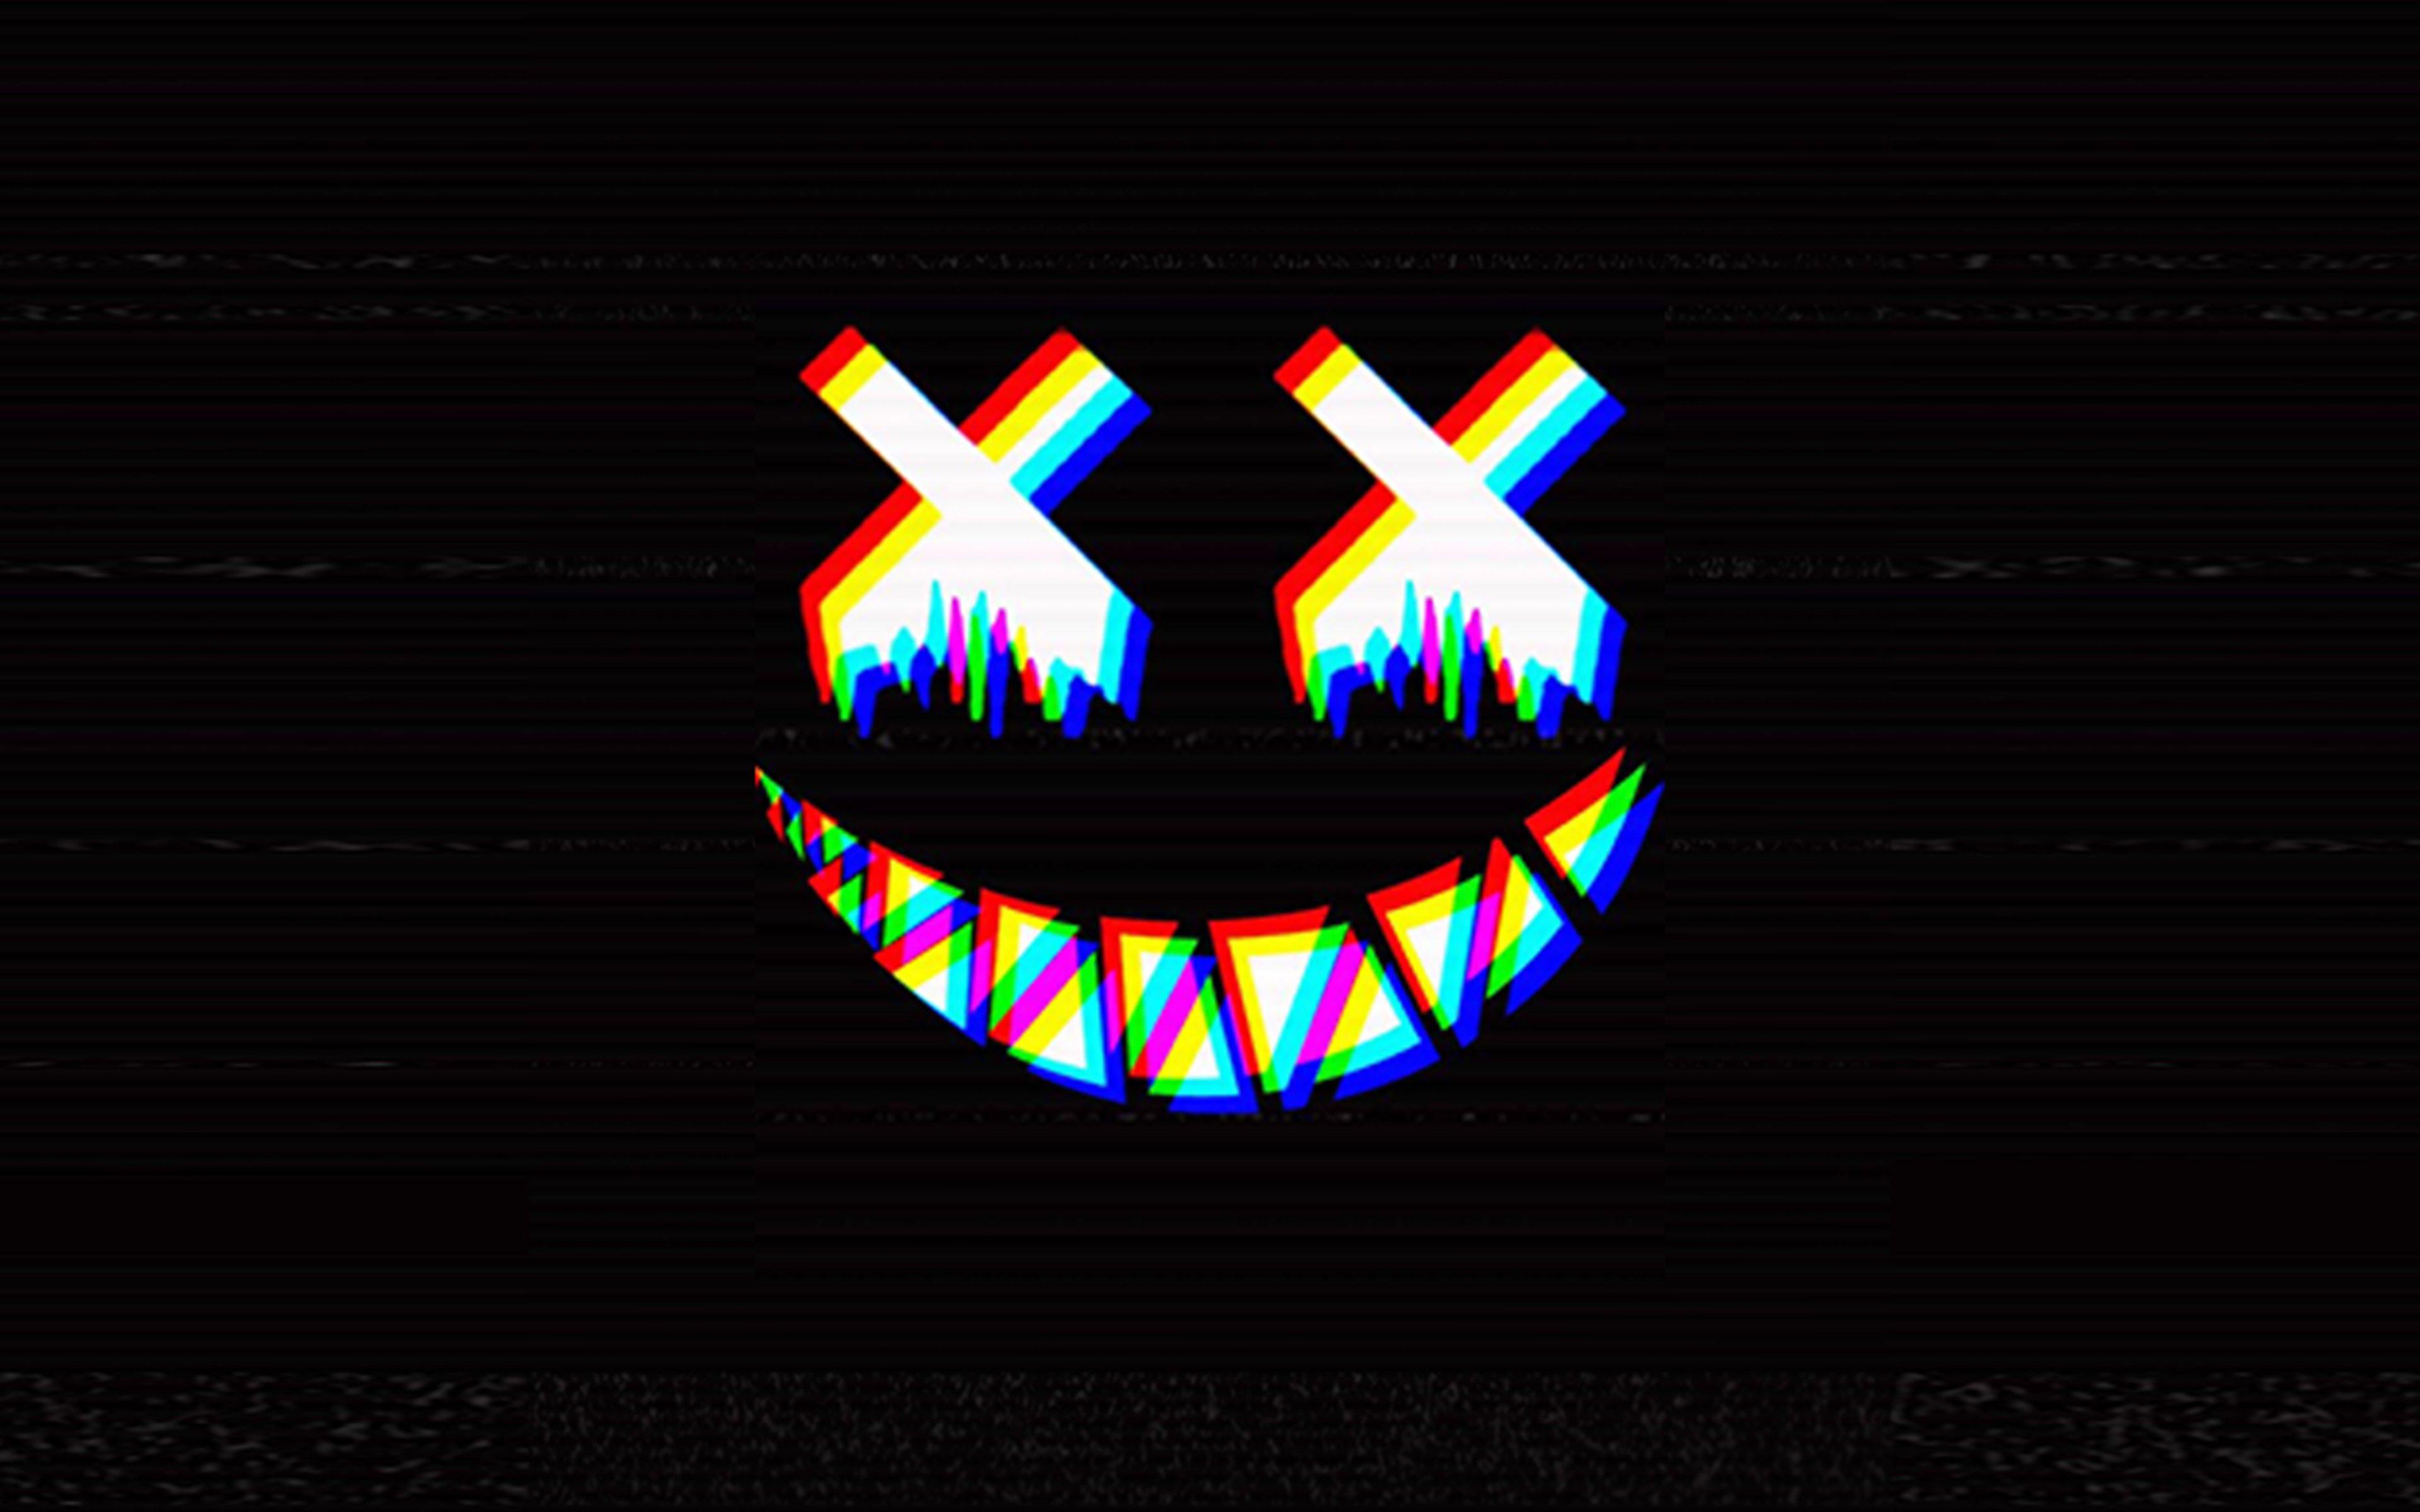 Fondos de pantalla Cara Sonrisa ilustración